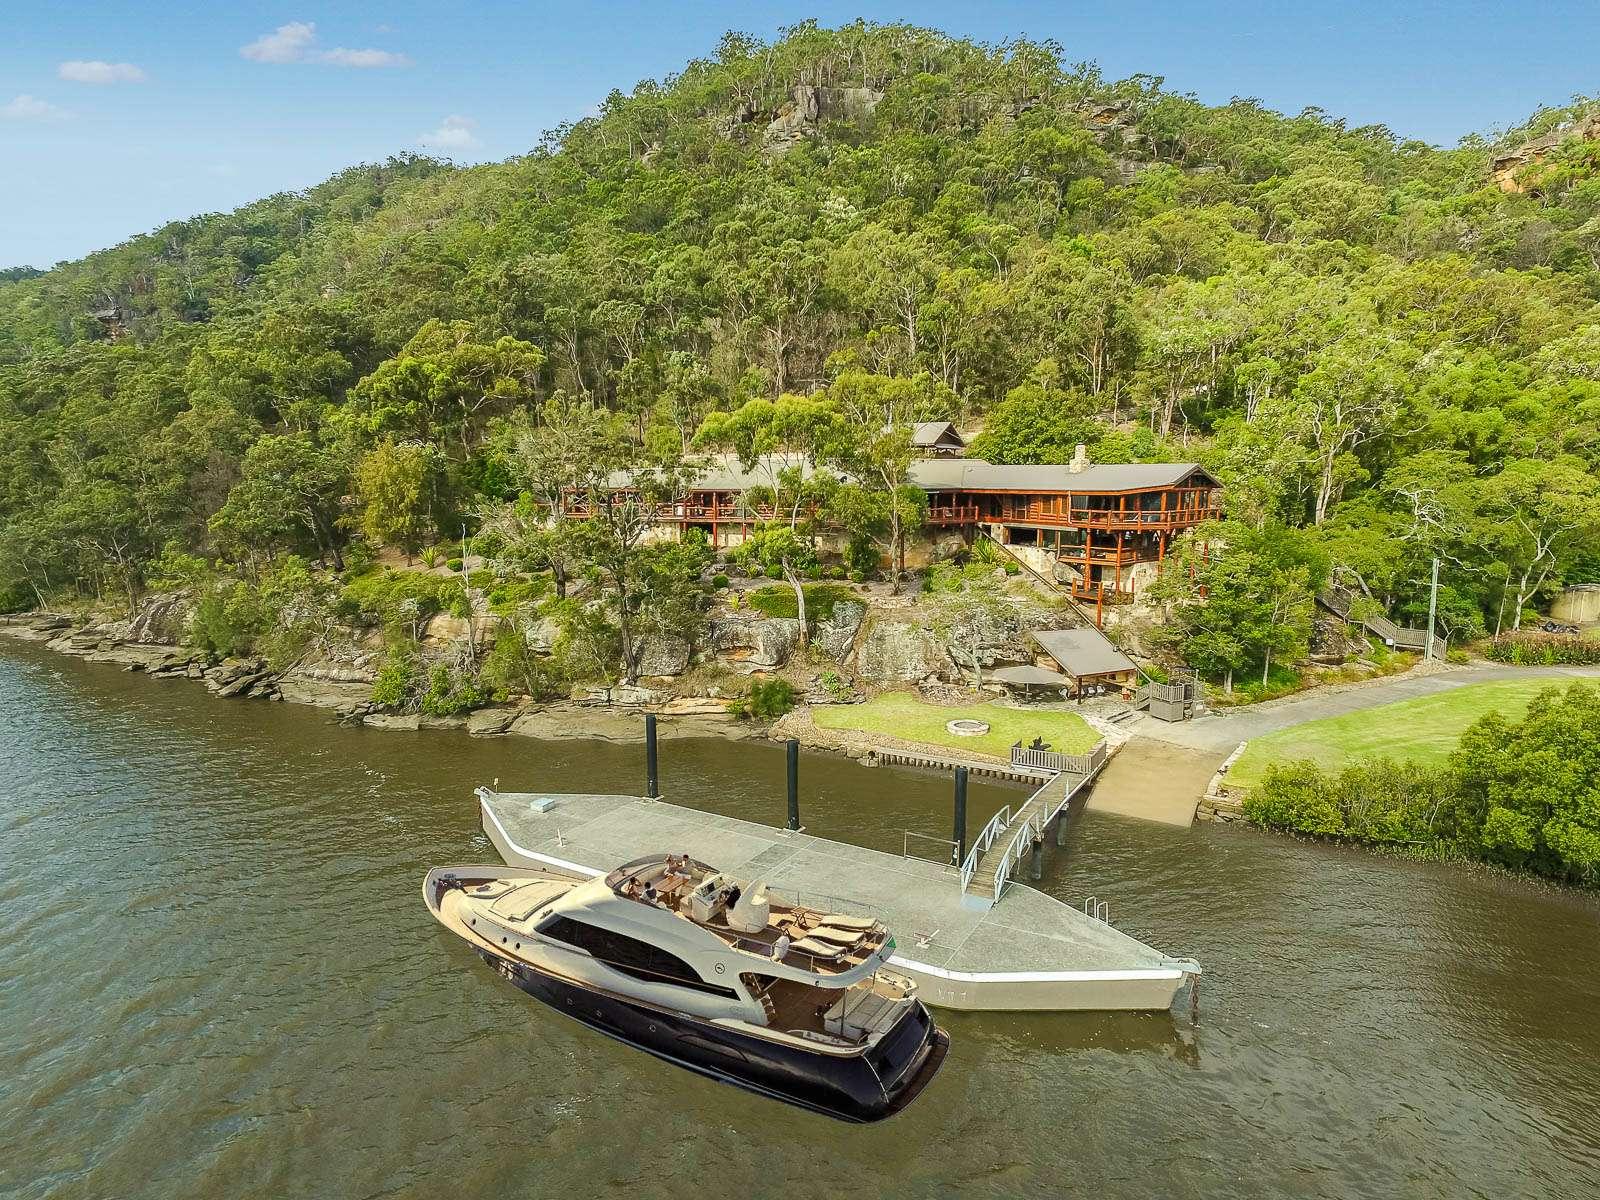 Spencer, NSW 2775